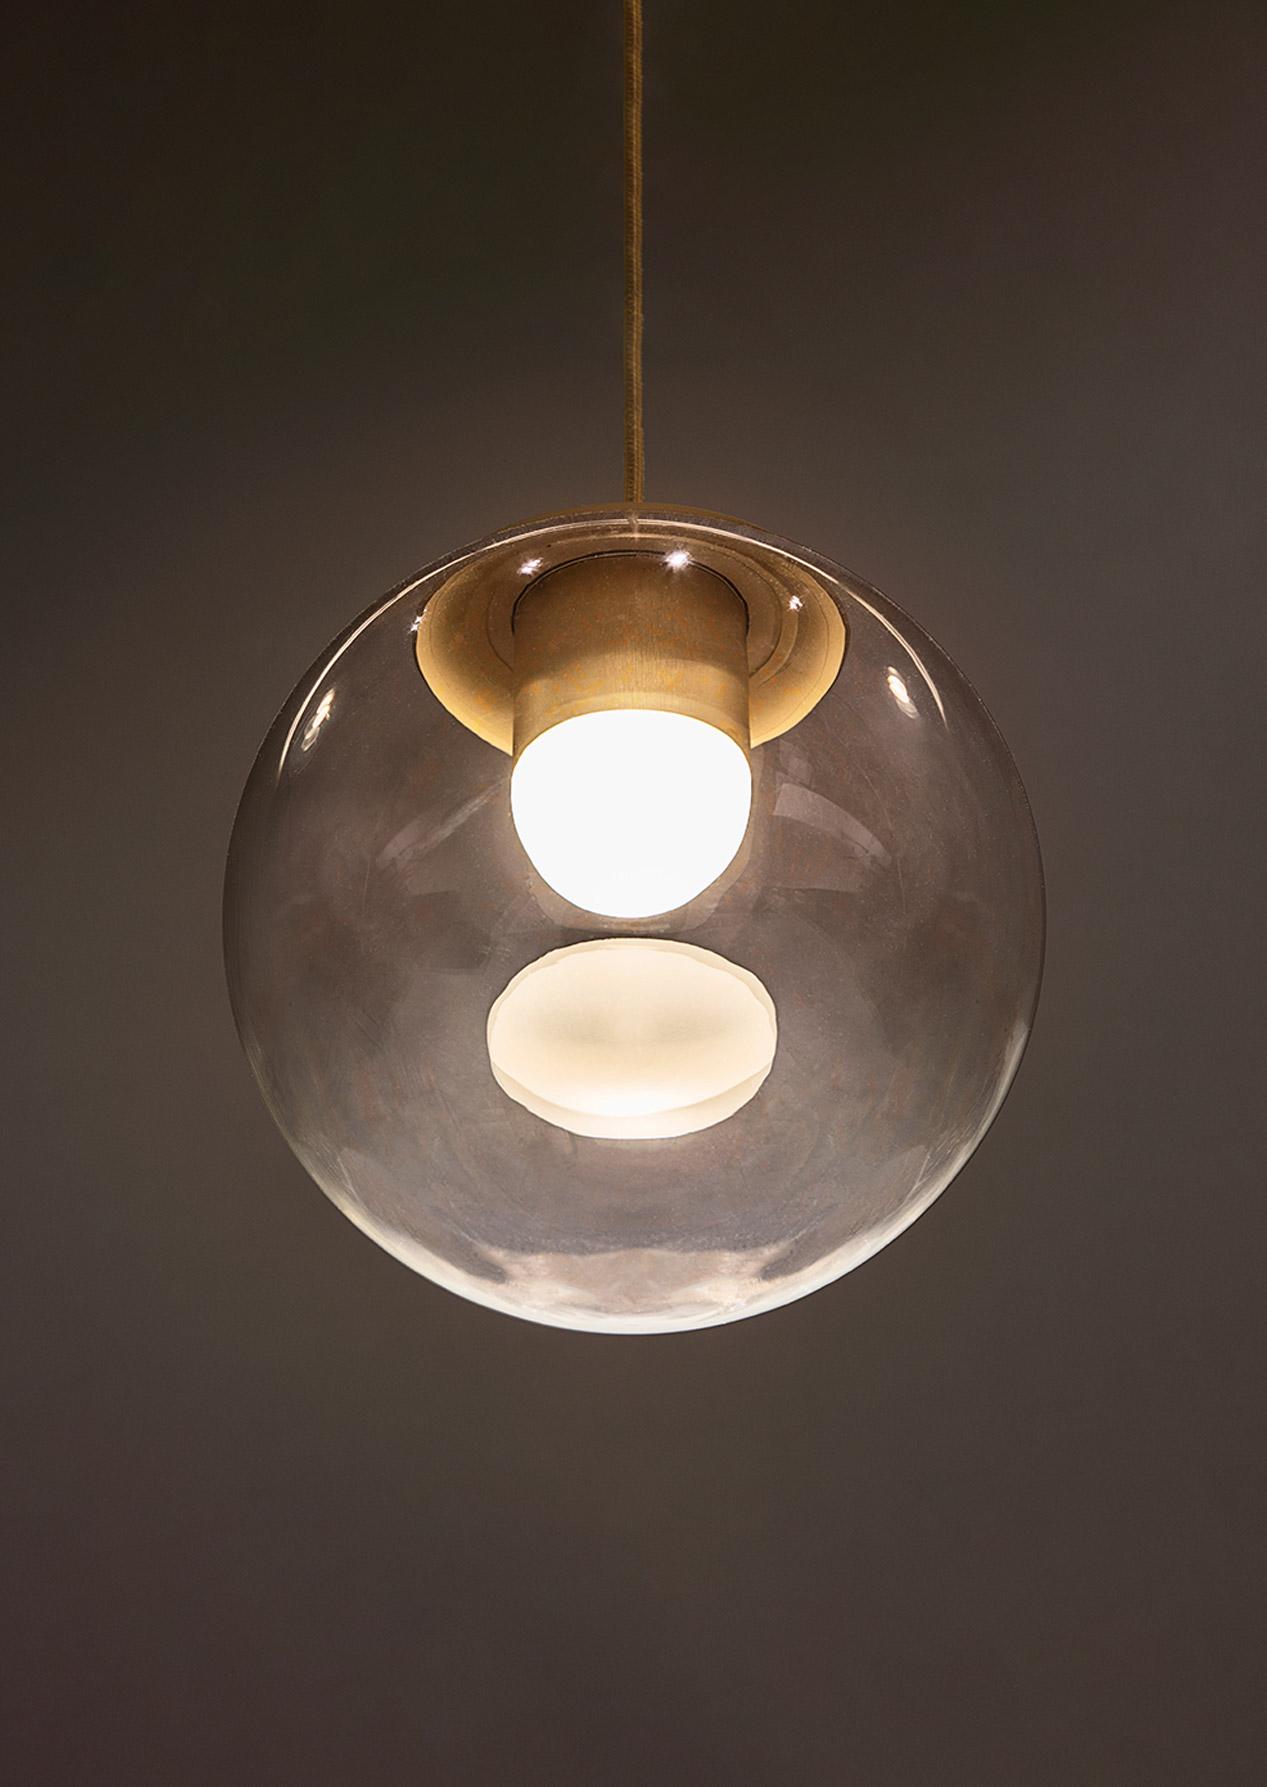 Handblown Clear Glass Globe Drop Pendant Light Brass Components Internal Glowing Dome Designers Nulty Bespoke